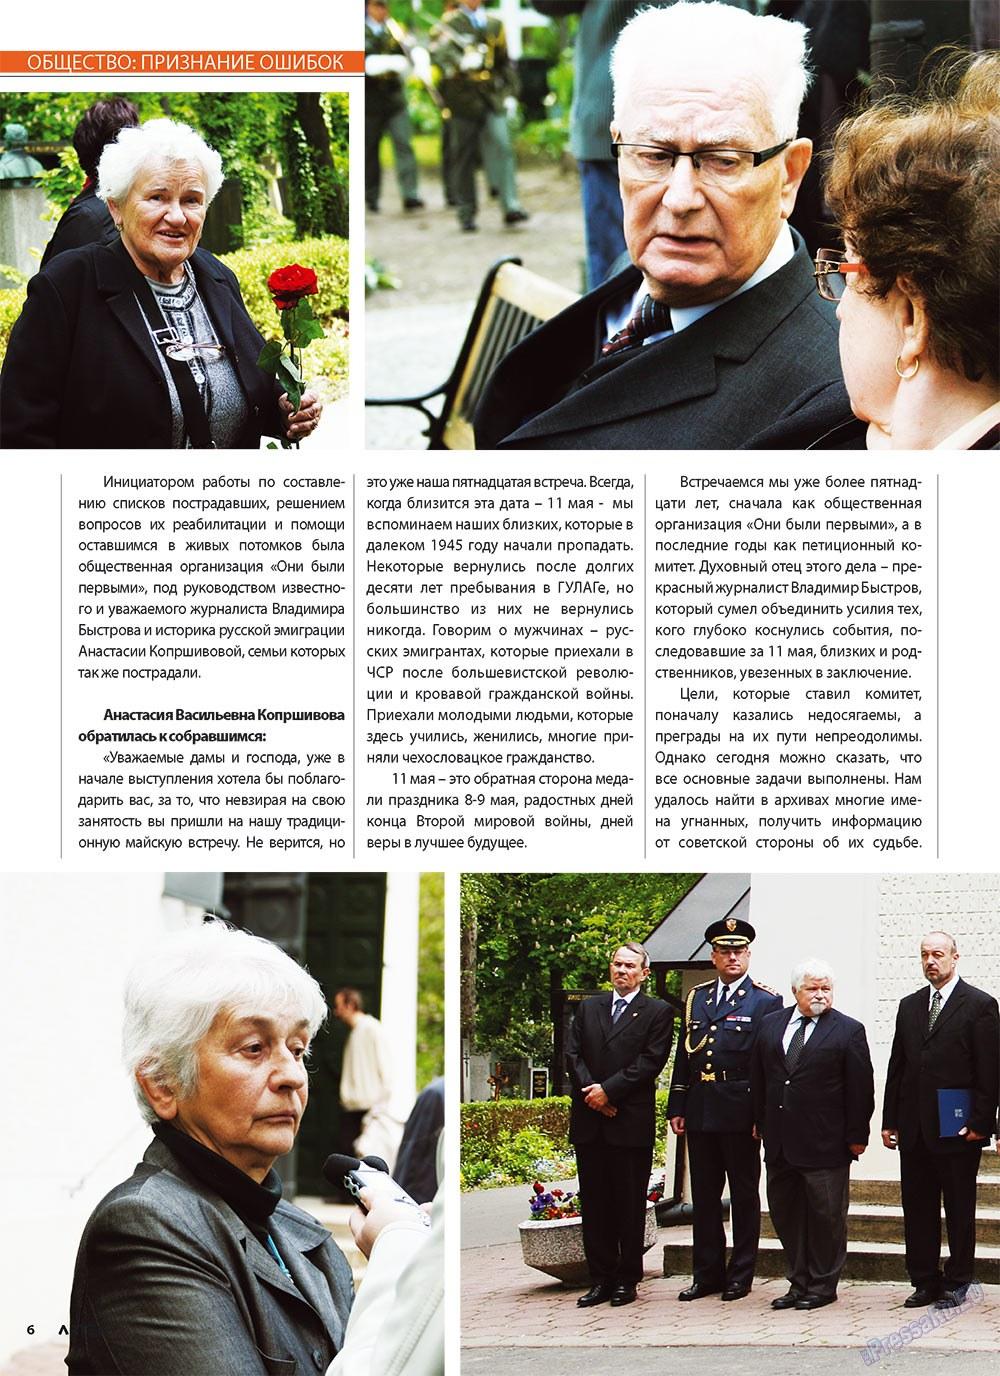 Артек (журнал). 2010 год, номер 3, стр. 8